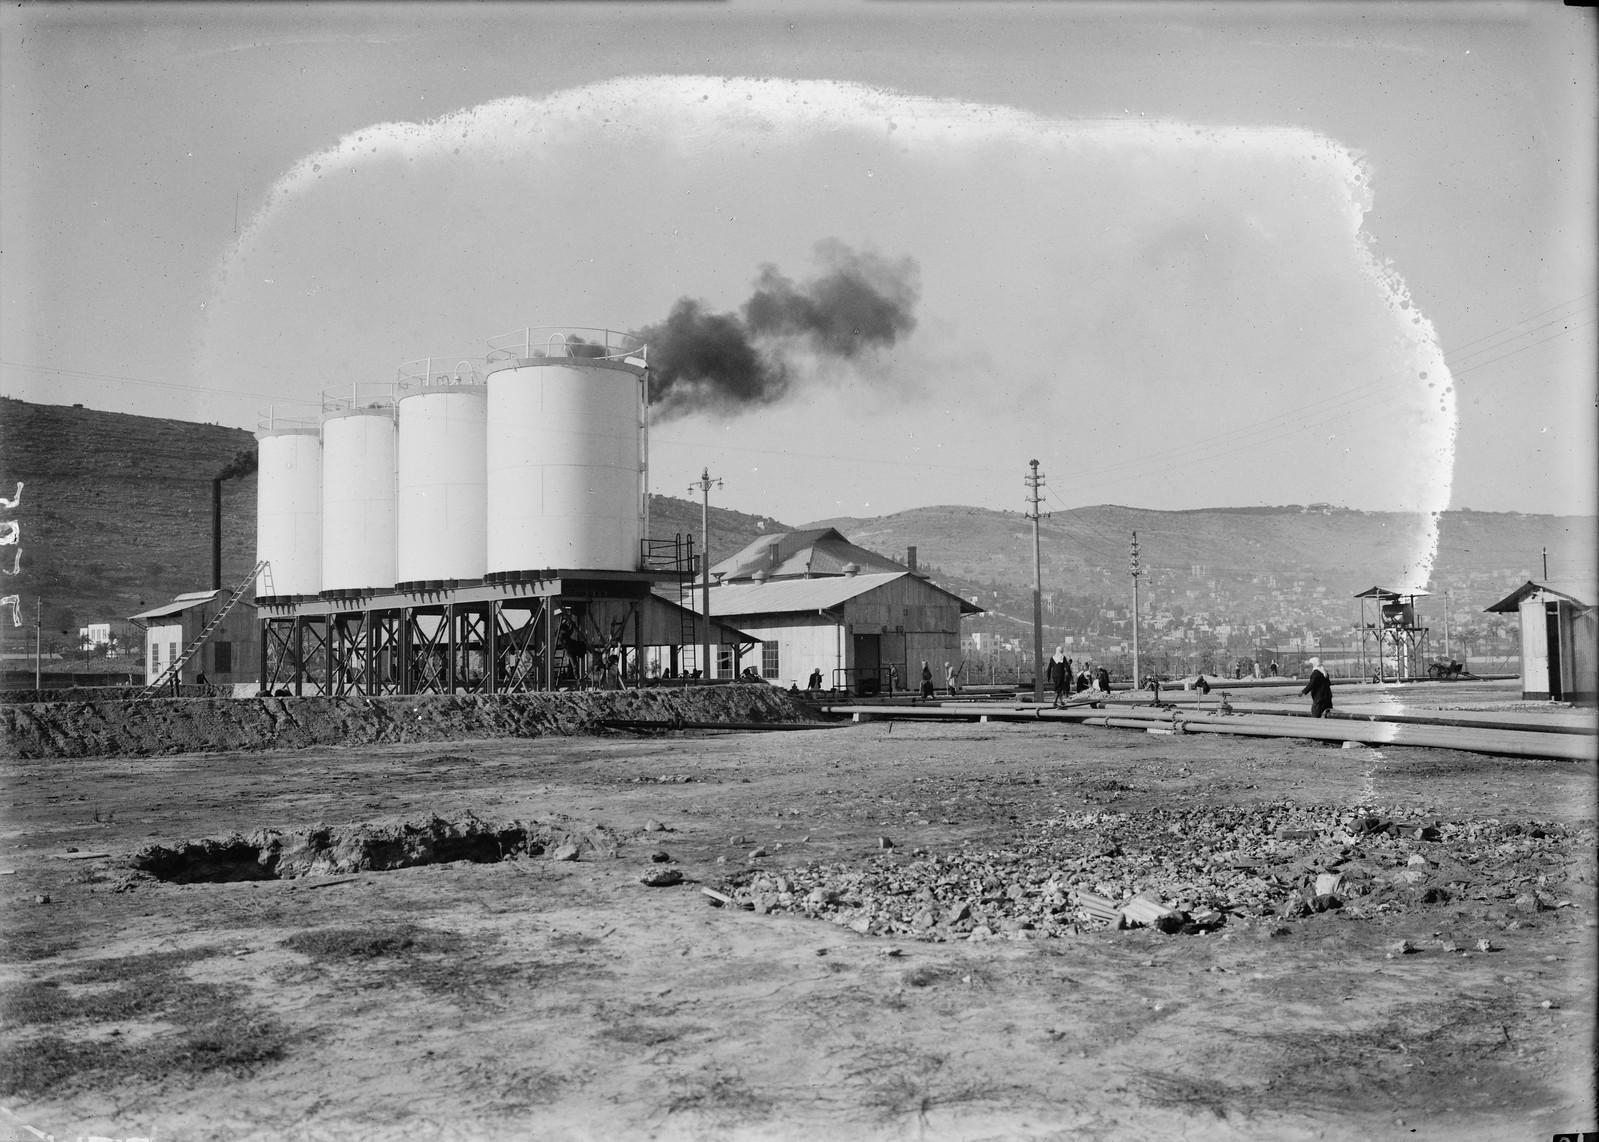 Нефтяные резервуары Шелл возле Хайфы (2)